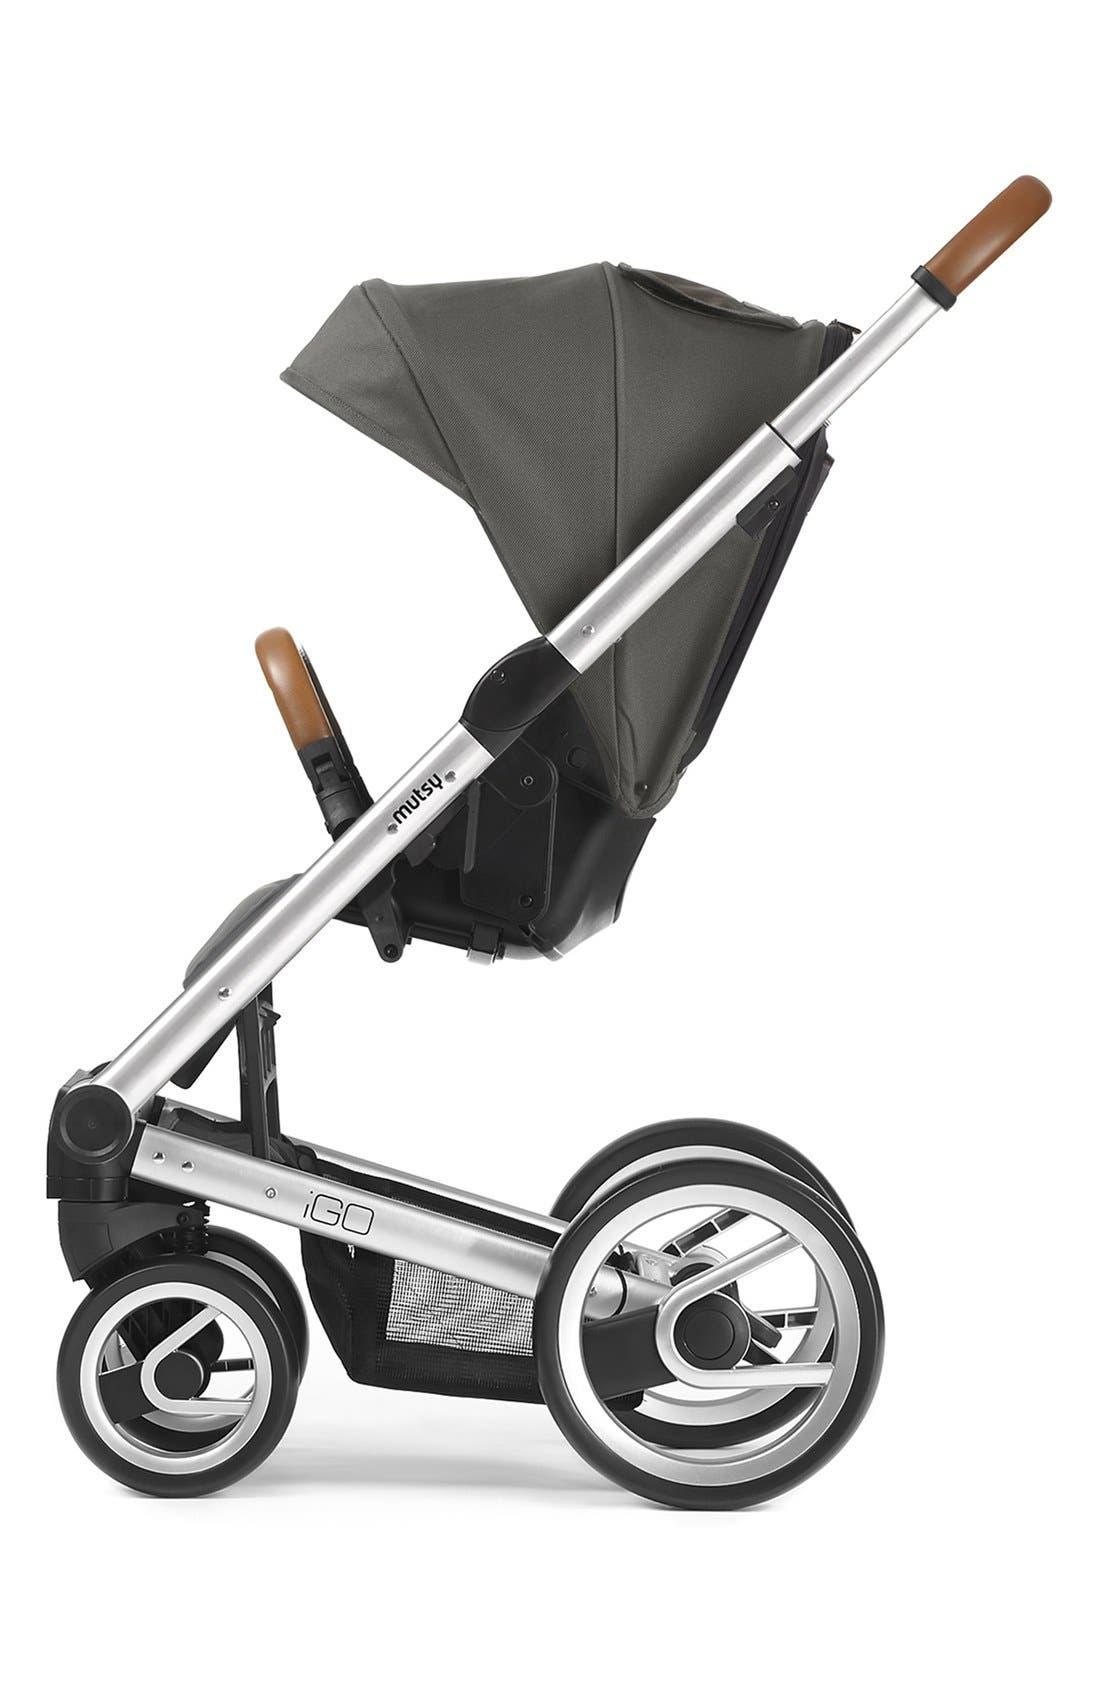 Igo - Urban Nomad Stroller,                         Main,                         color, 020